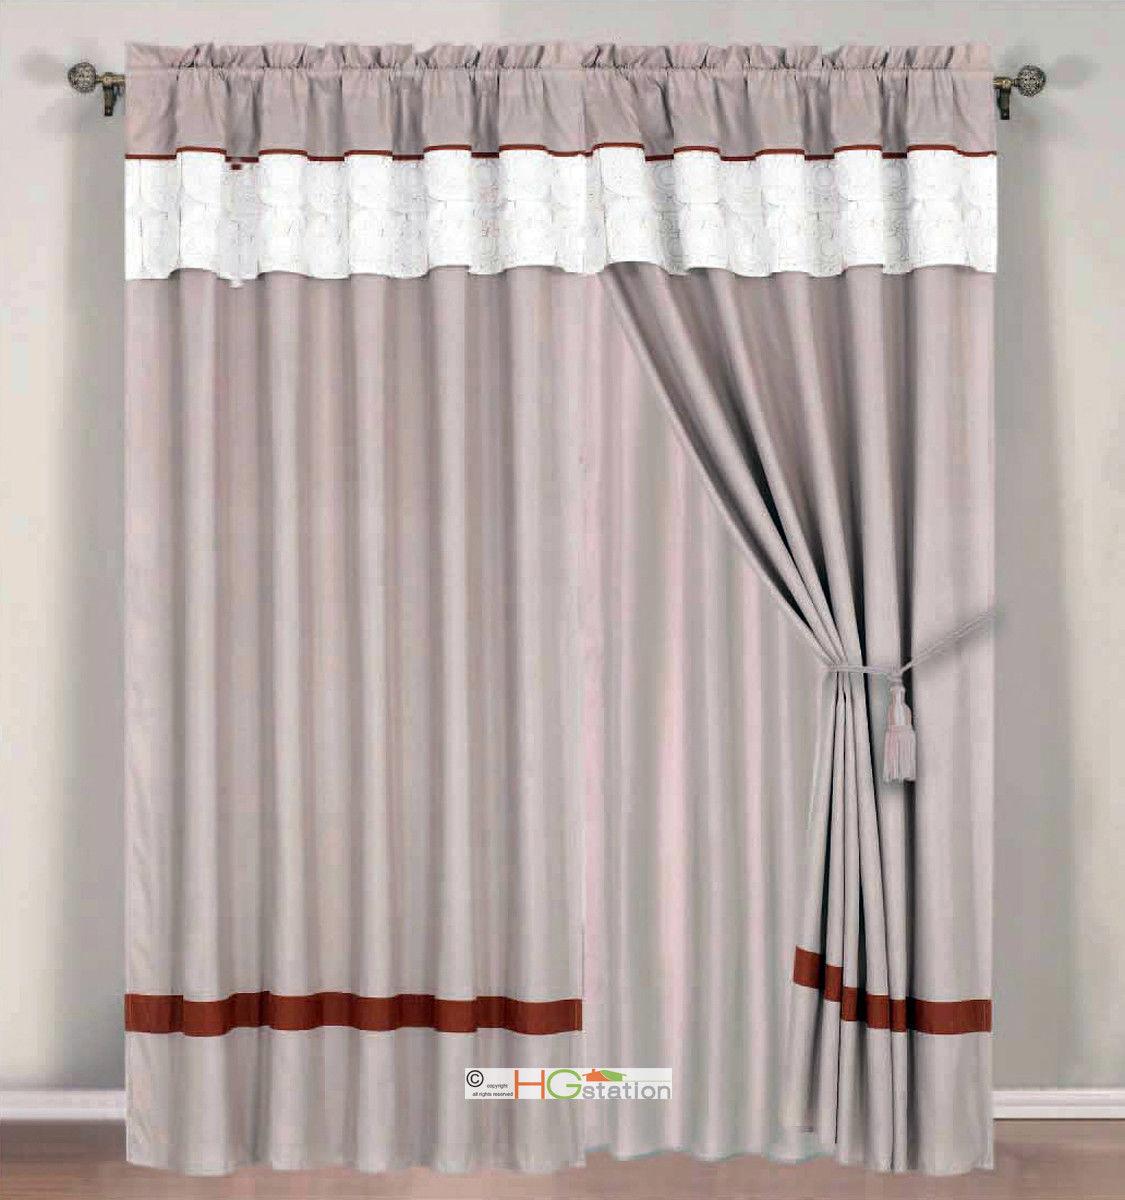 4Pc Quilted Autumn Sun Floral Striped Curtain Set White Khaki Rust Valance Drape - $40.89